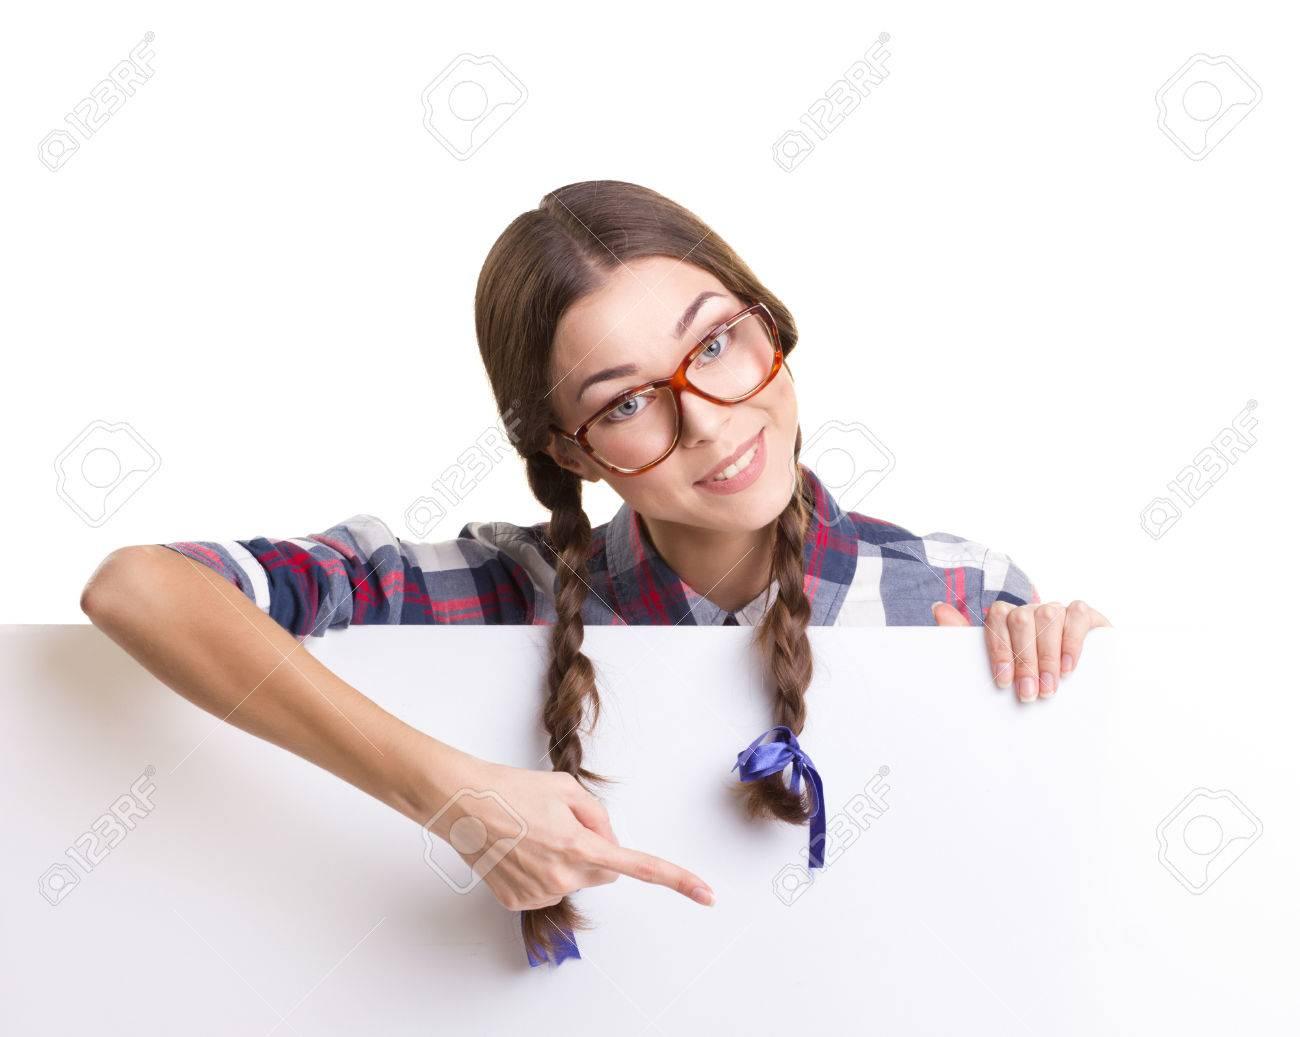 Fee sex cumming vieos